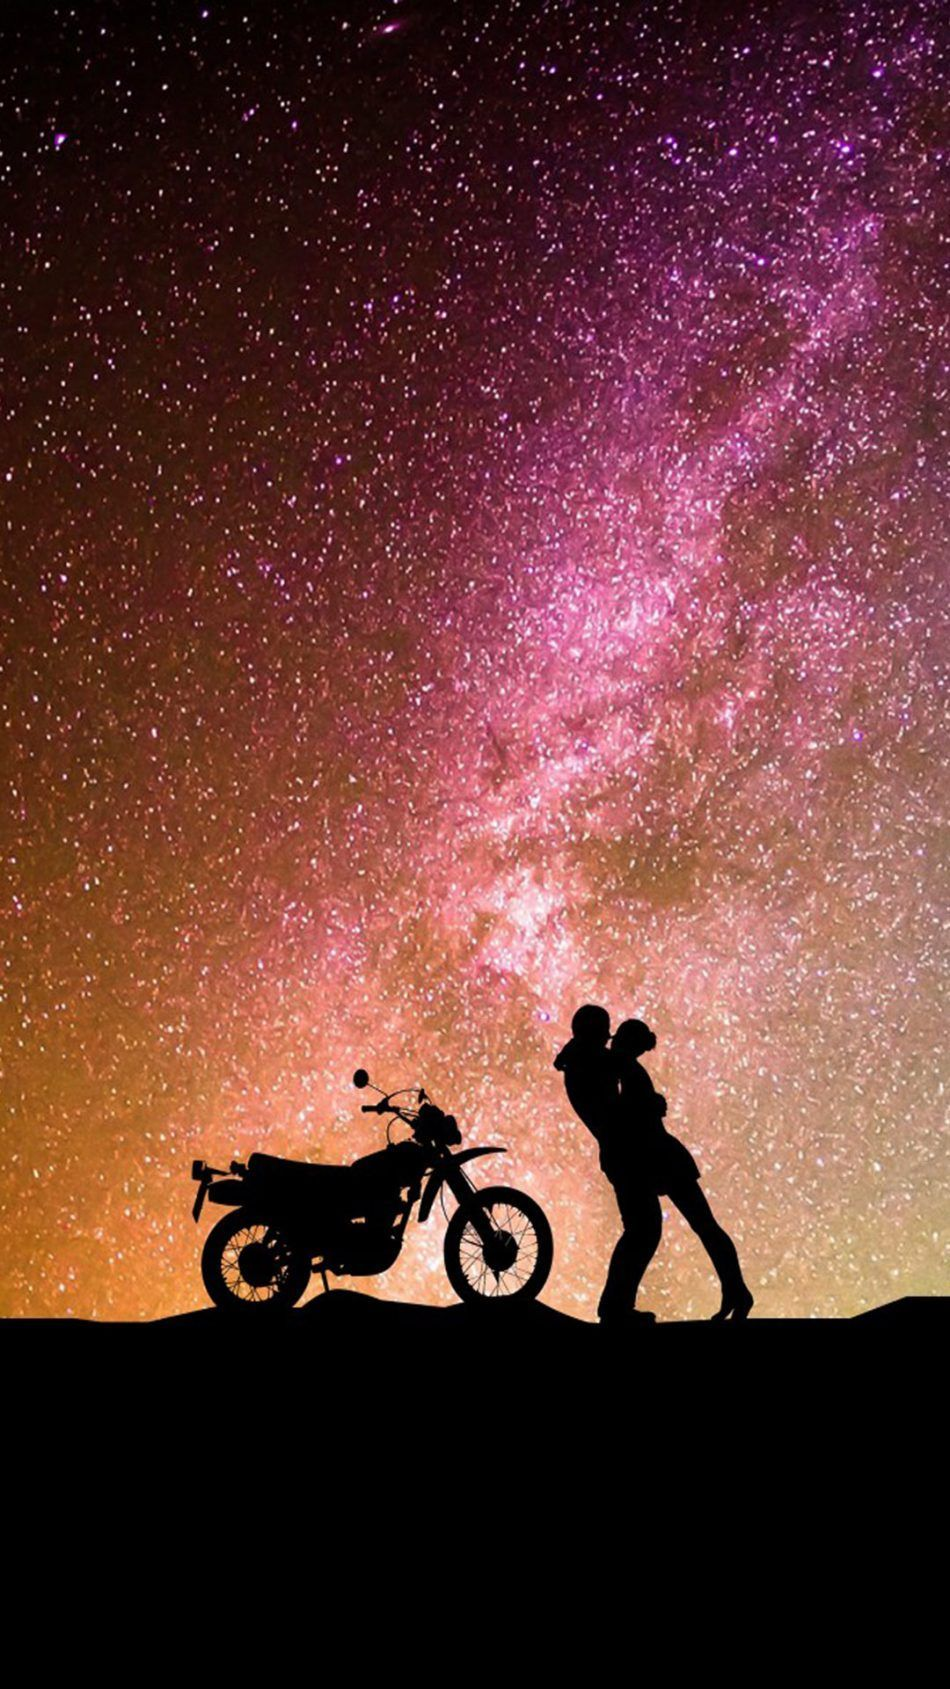 Download Couple Romantic Kiss Motorcycle Free Pure 4k Ultra Hd Mobile Wallpaper 2020 Spor Motosikletler Fotograf Yeni Ask Sozleri